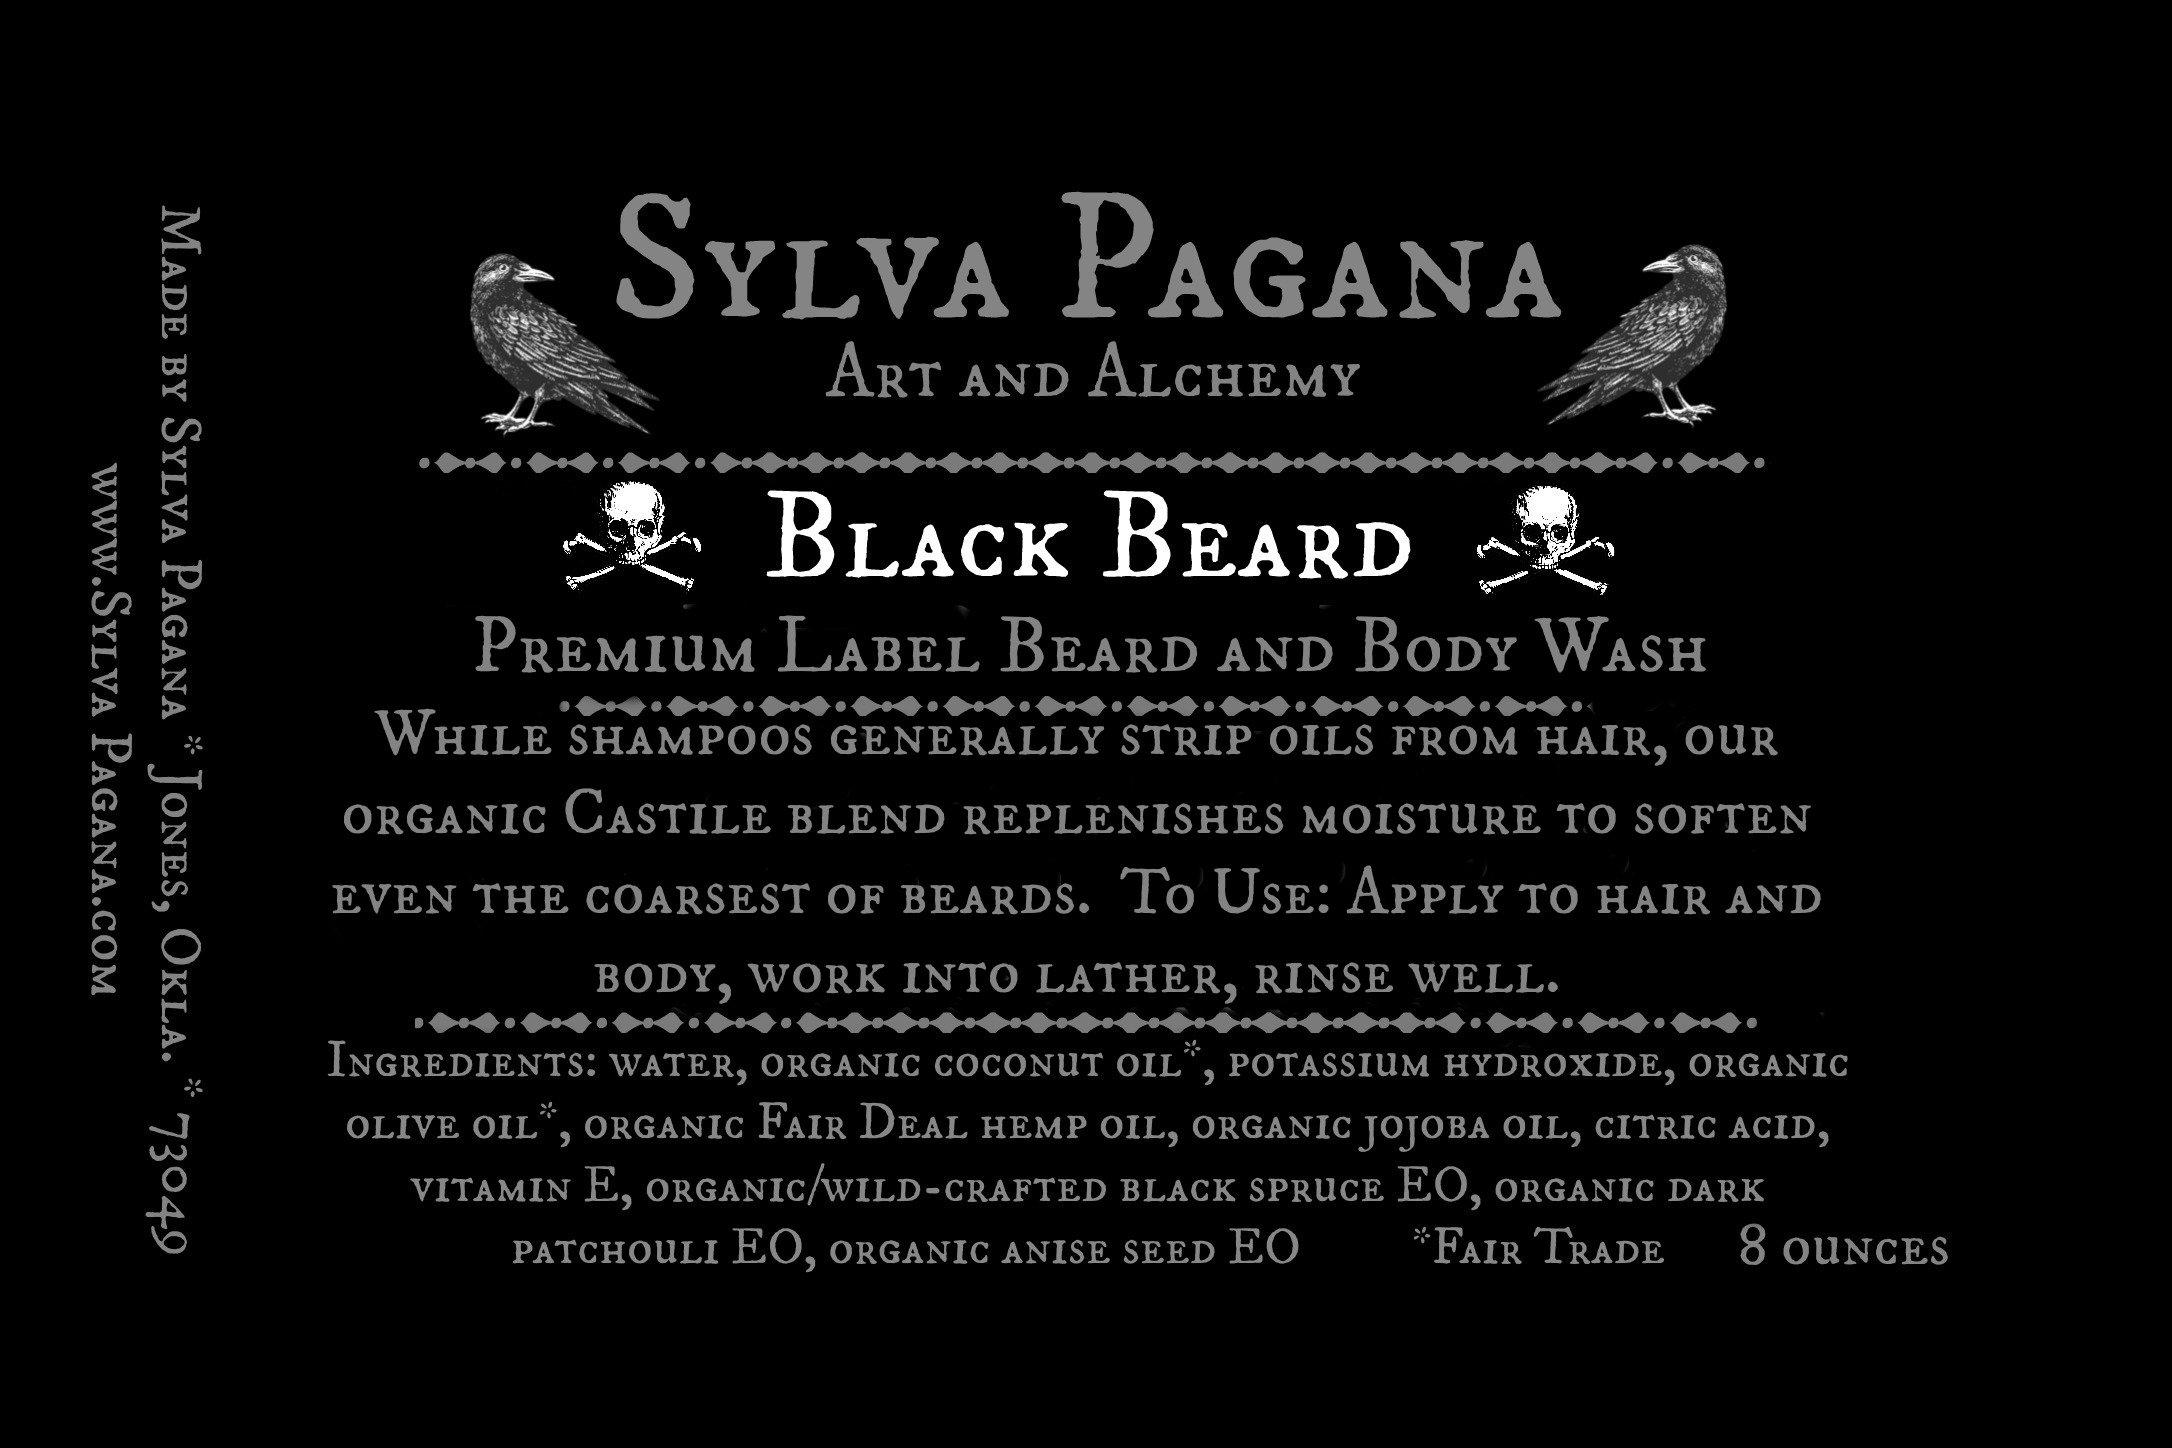 Beard and Body Wash - PREMIUM Label